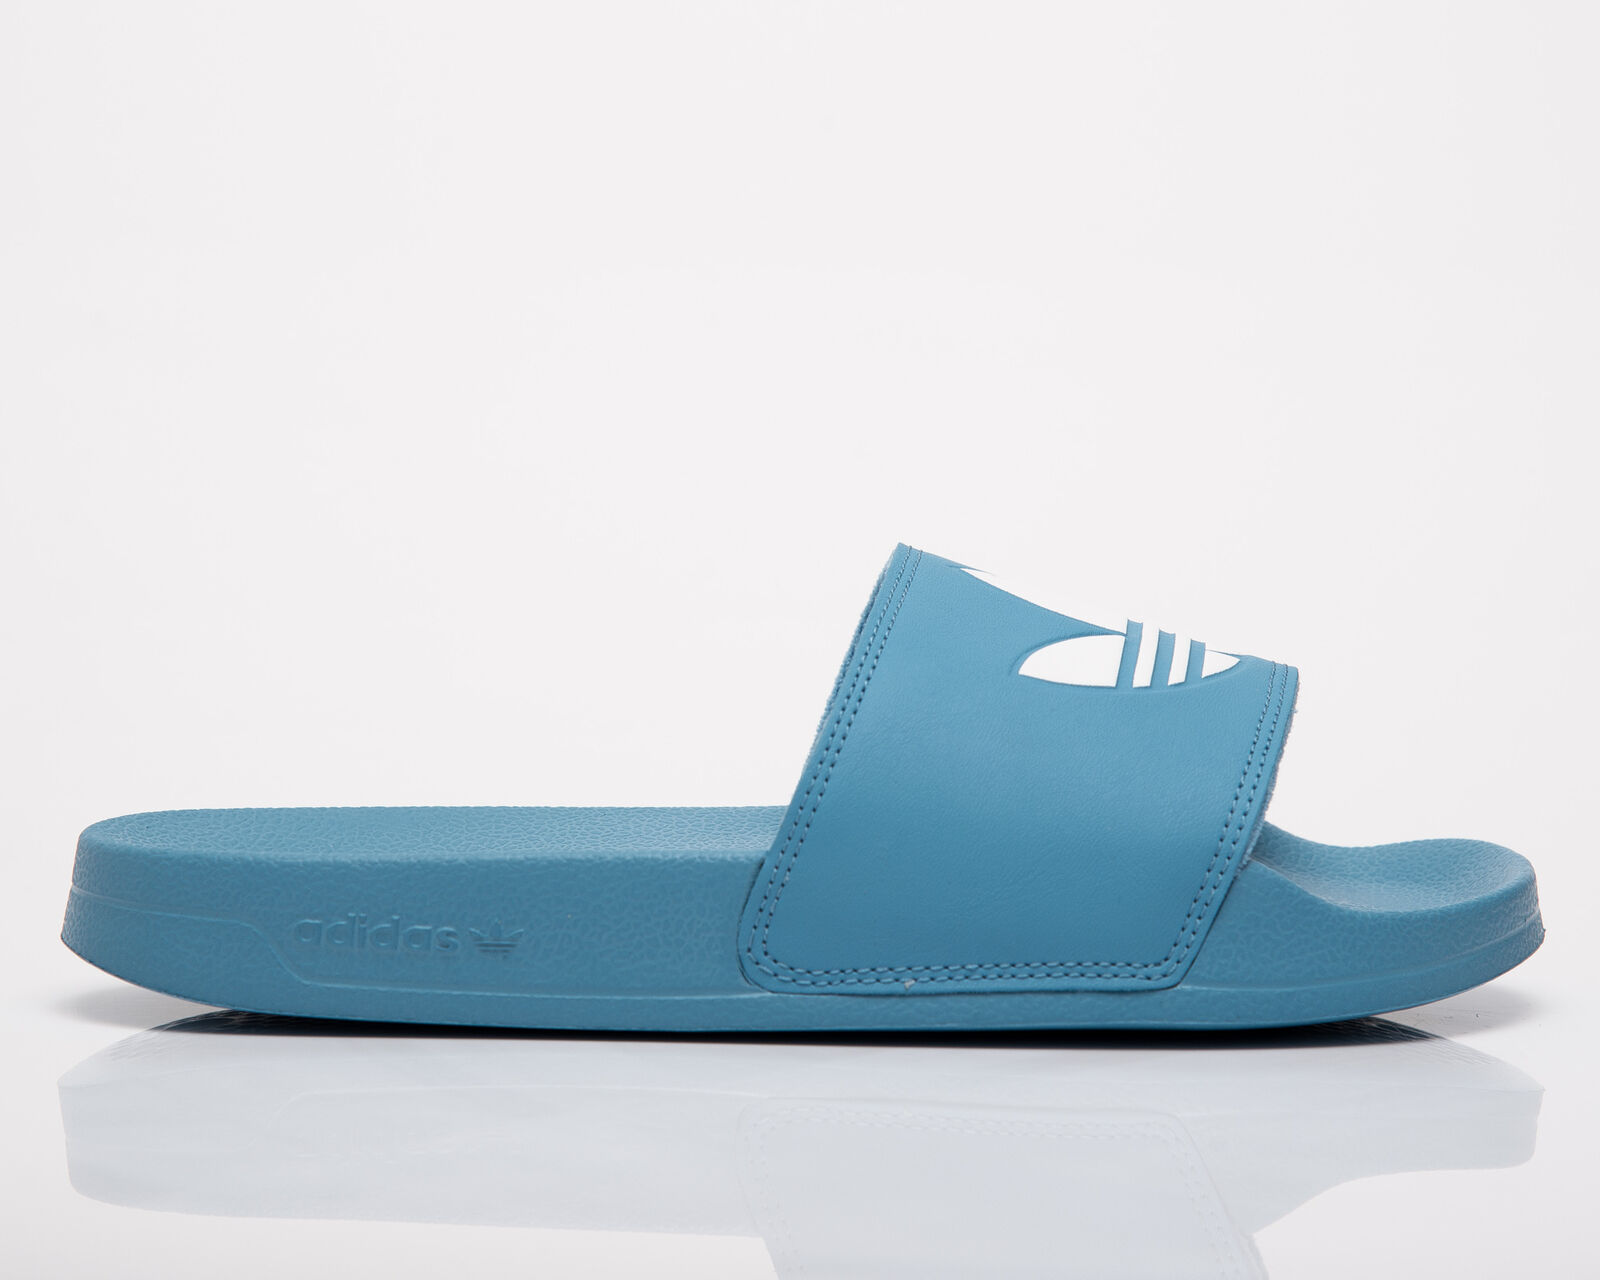 Adidas Originals Adilette Lite Femmes Brumeux Bleu Blanc Vie Glissières Sport